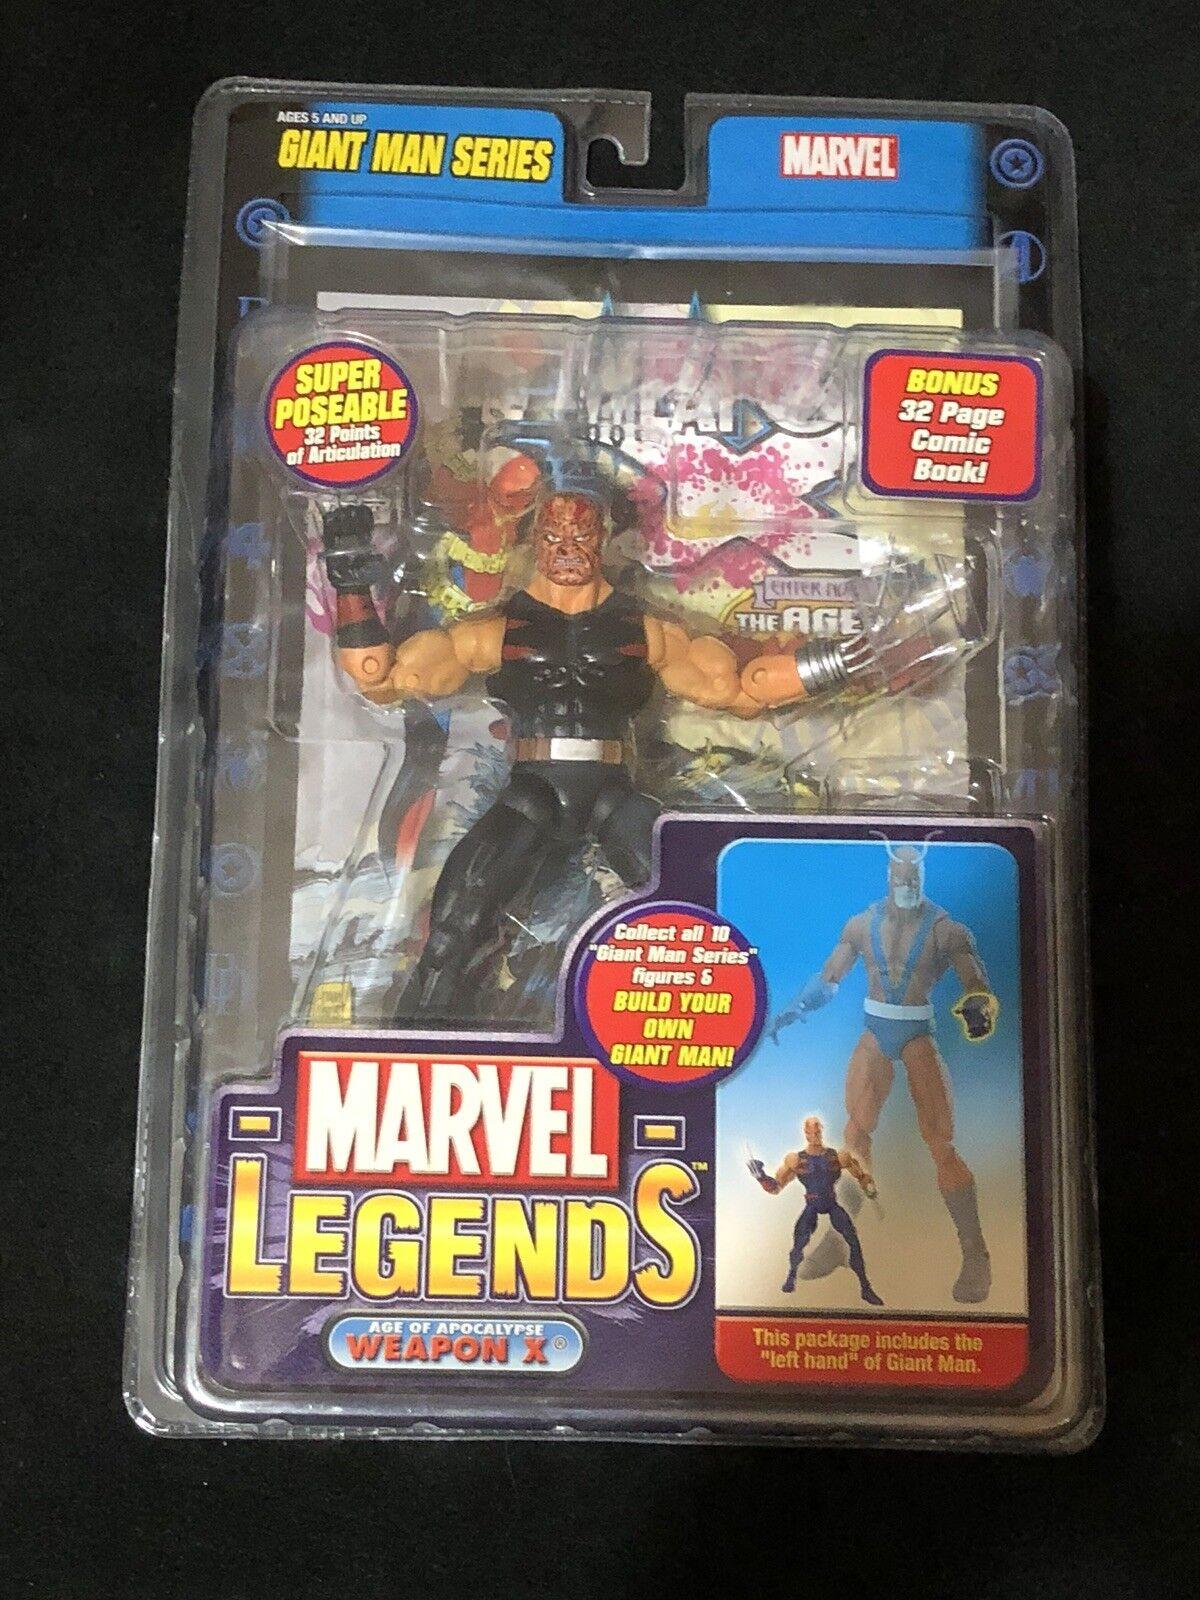 Weapon X Age of Apocalypse Marvel Legends Toybiz Giant Man Series Variant